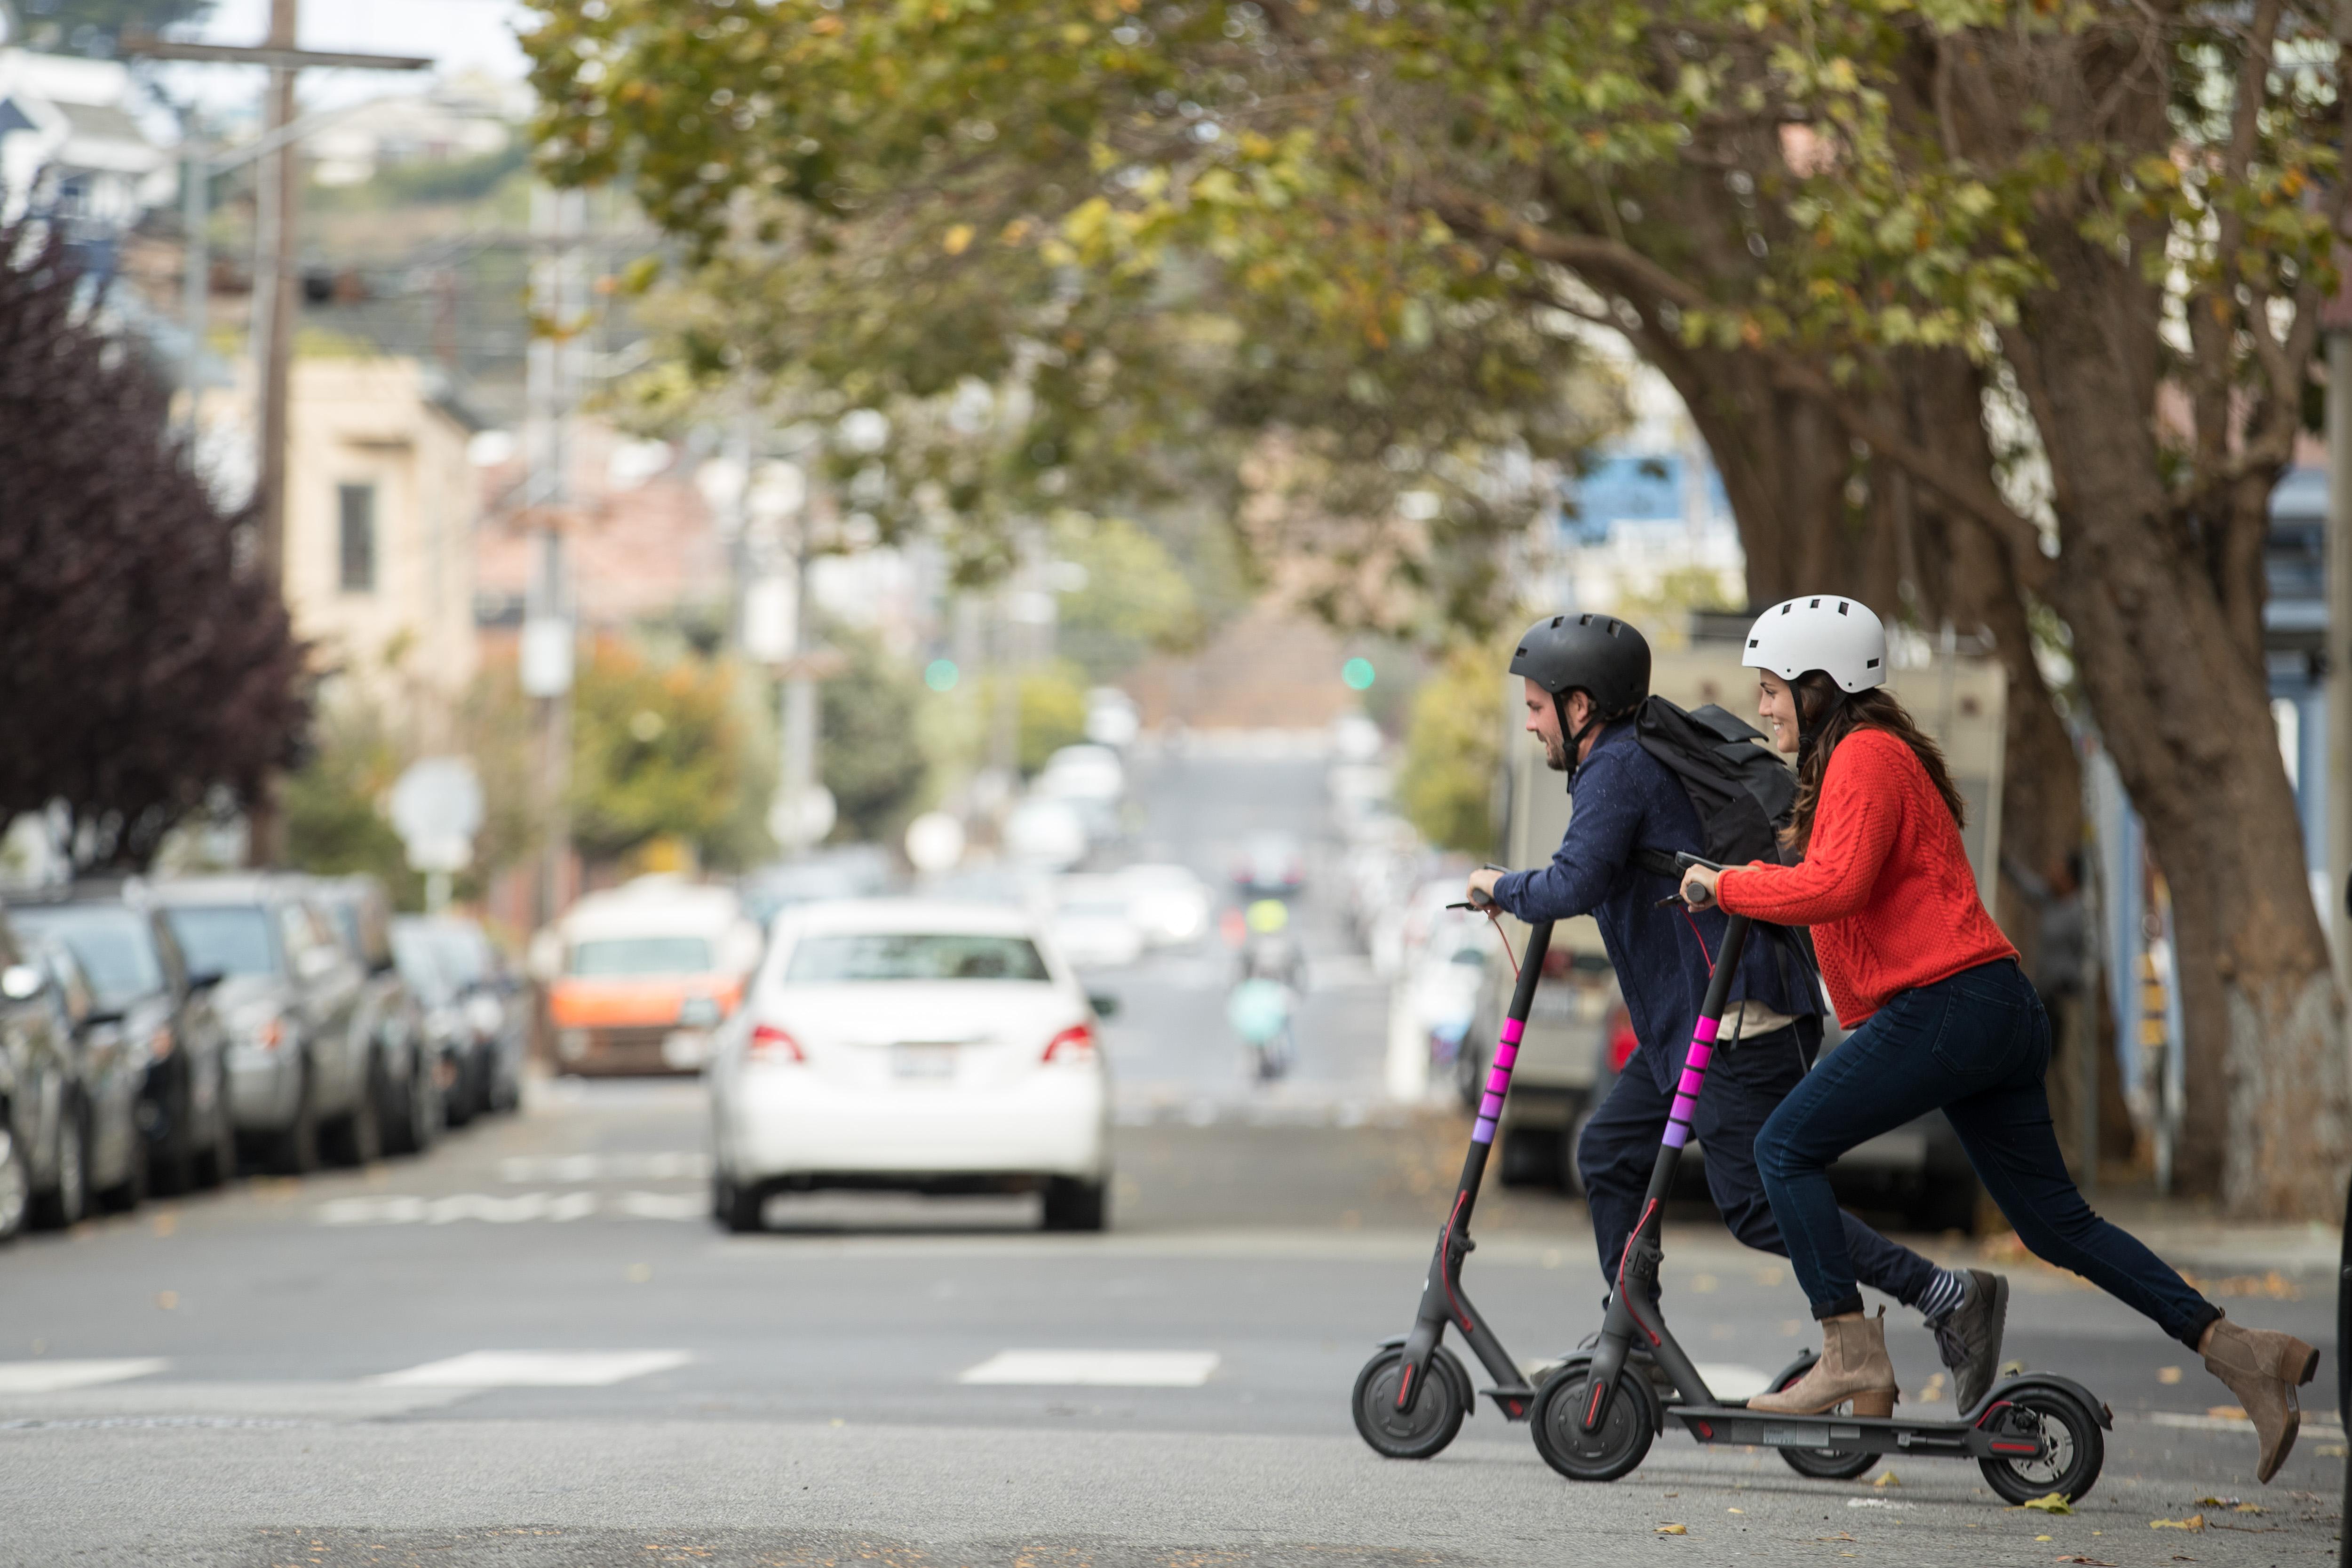 two people on Lyft scooters crossing a street